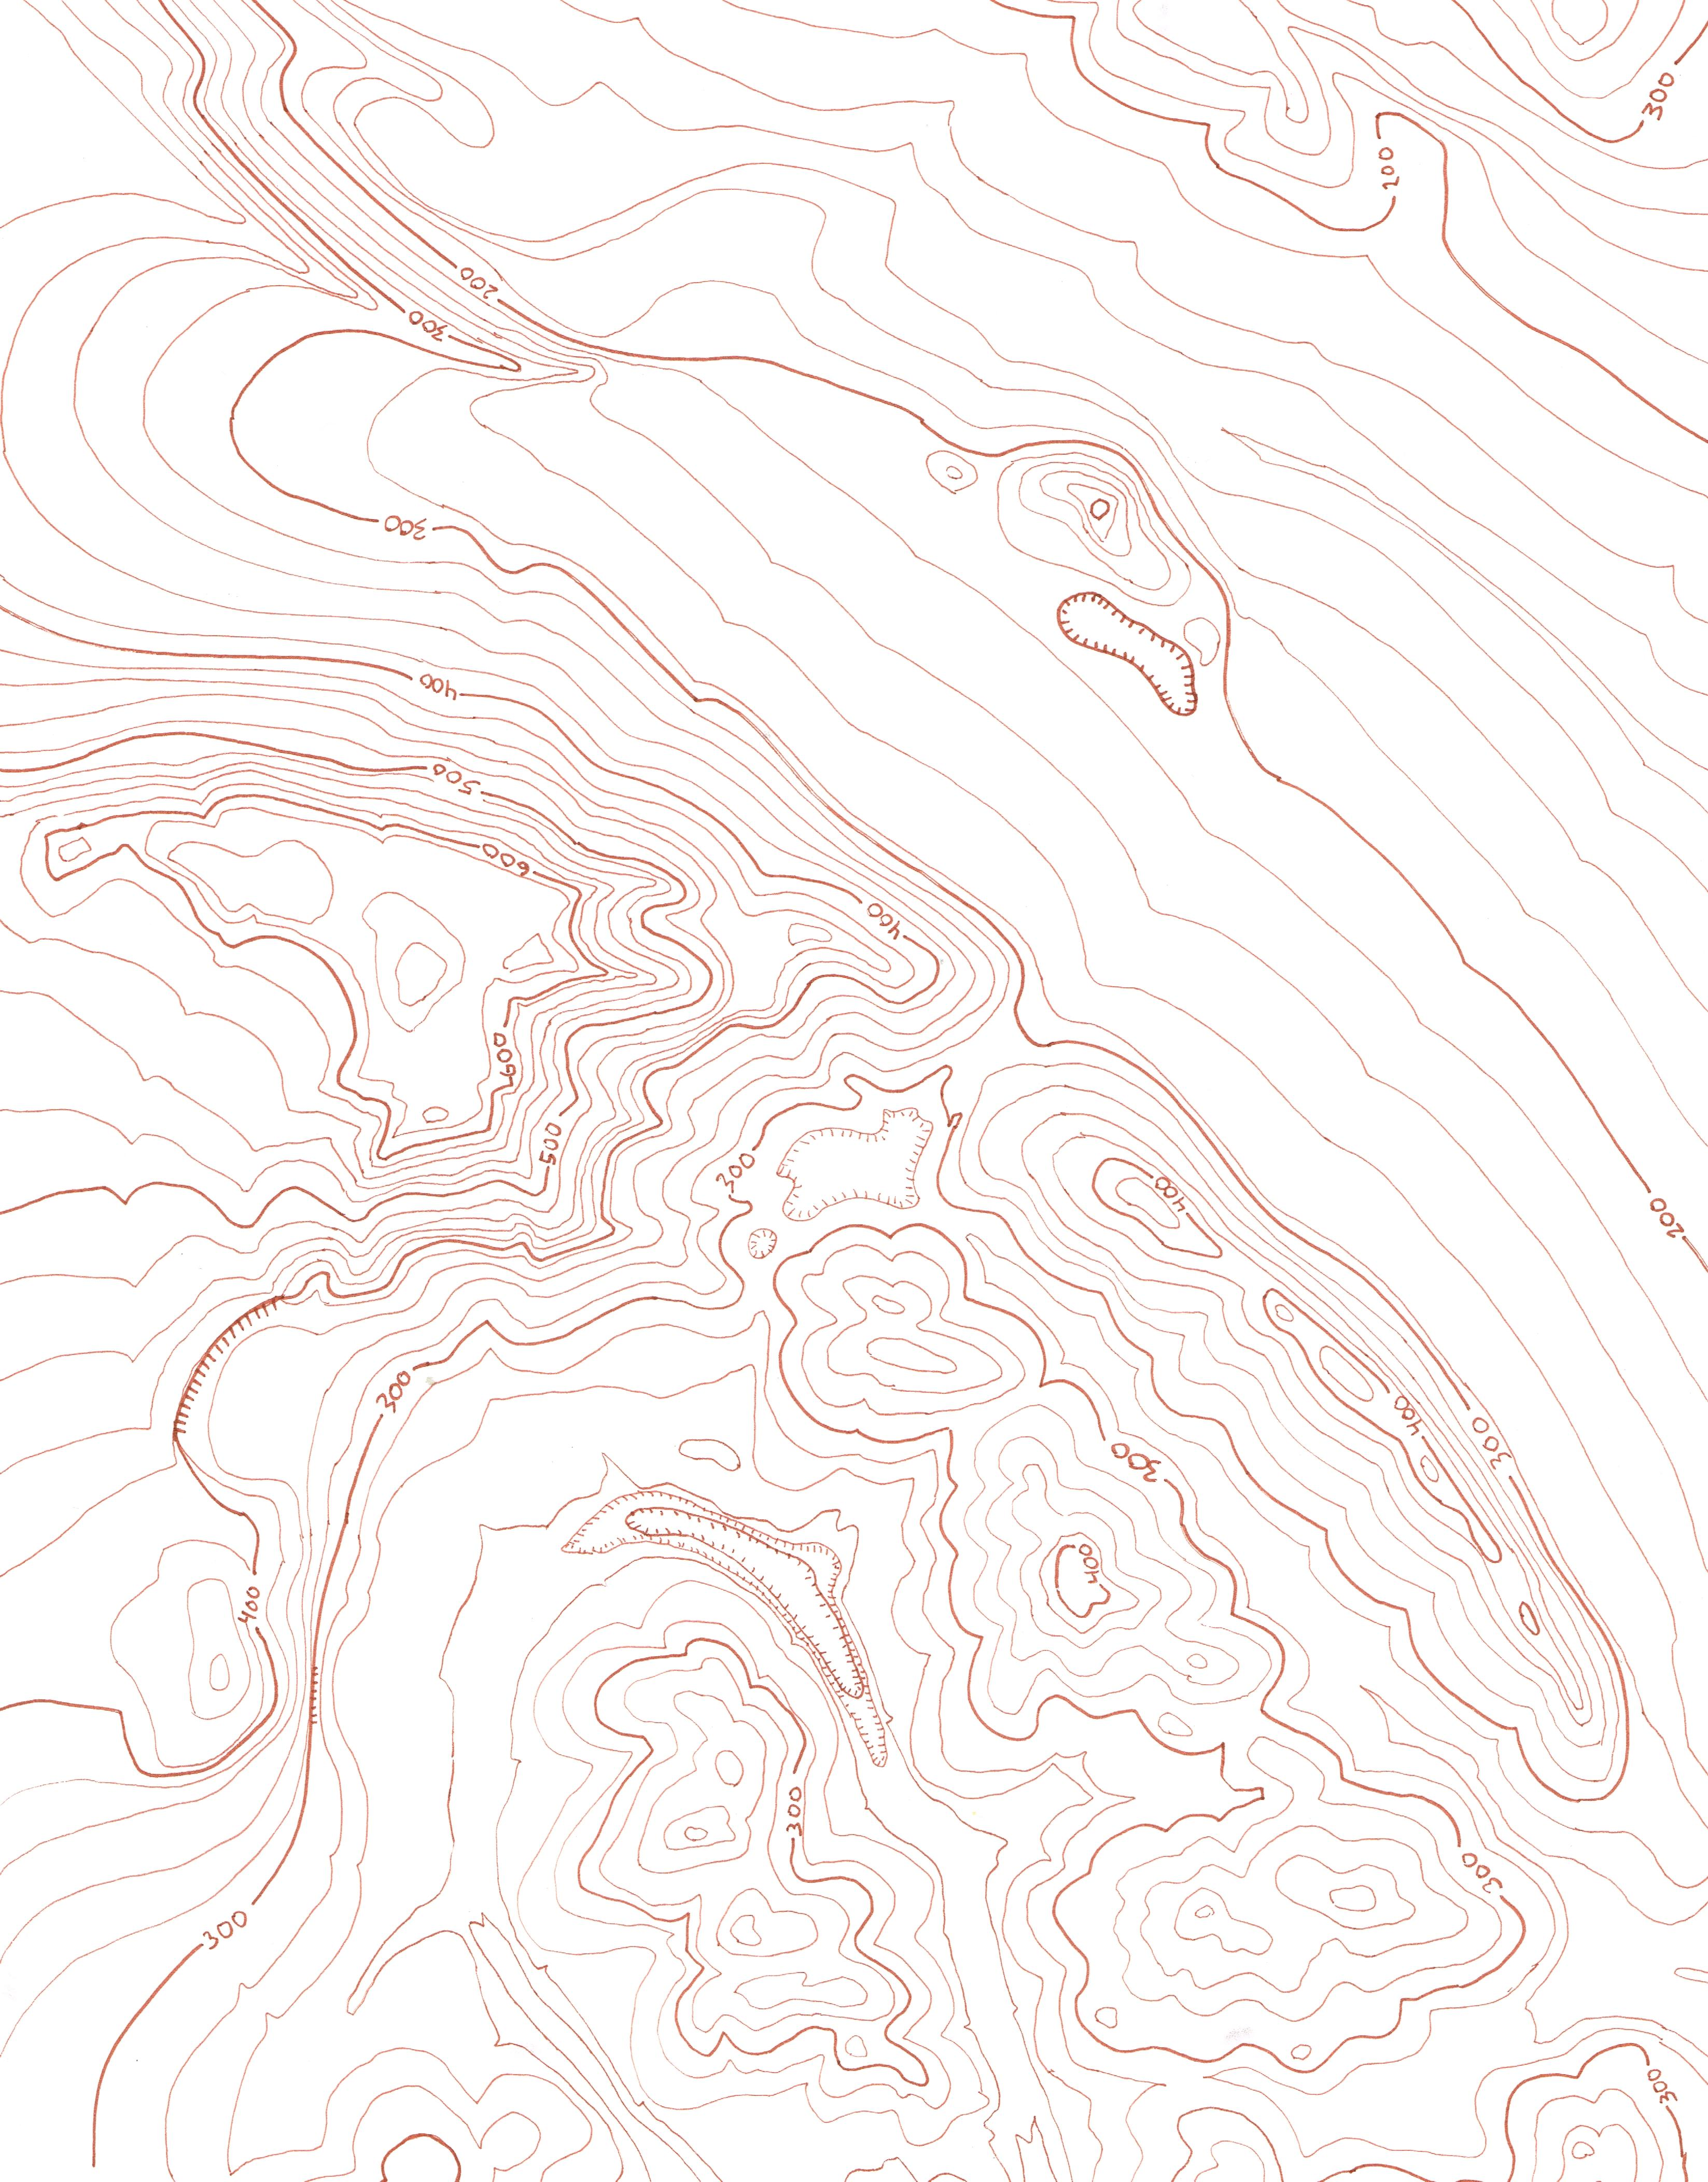 Hand Drawn Topographic Maps